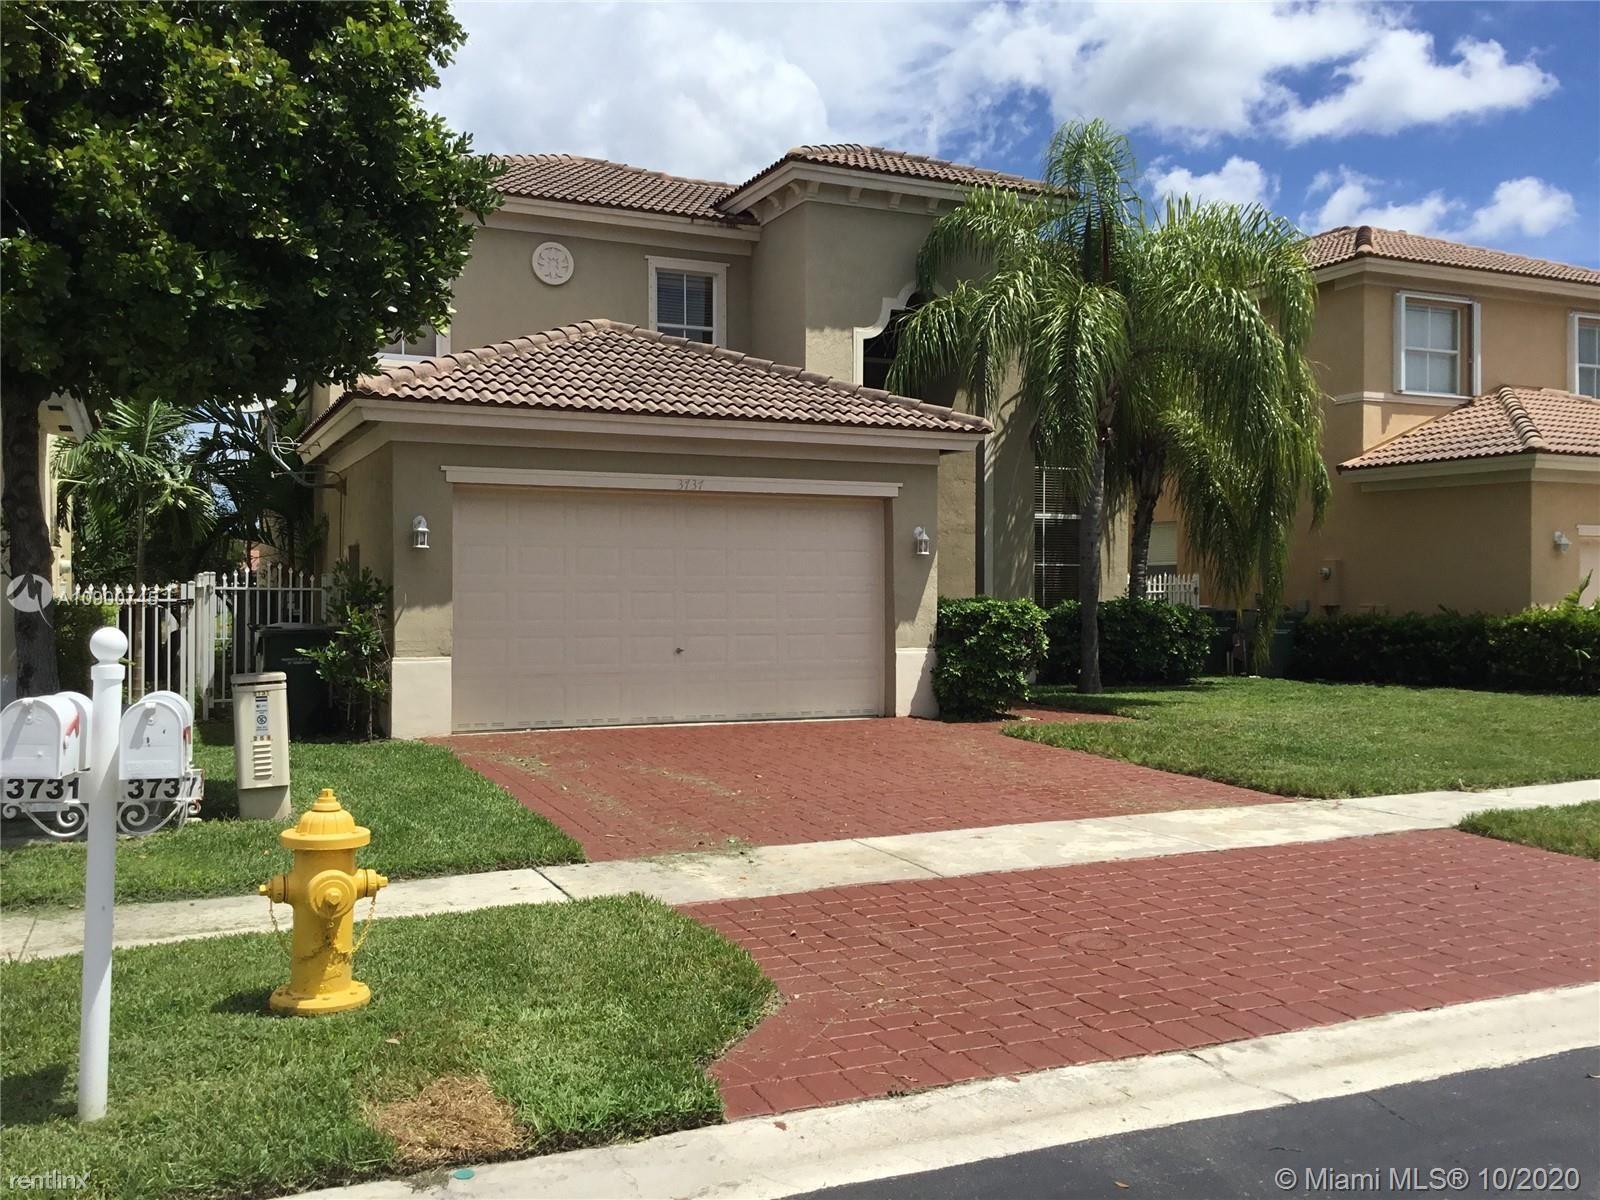 3737 NE 19th St, Homestead, FL - $2,900 USD/ month